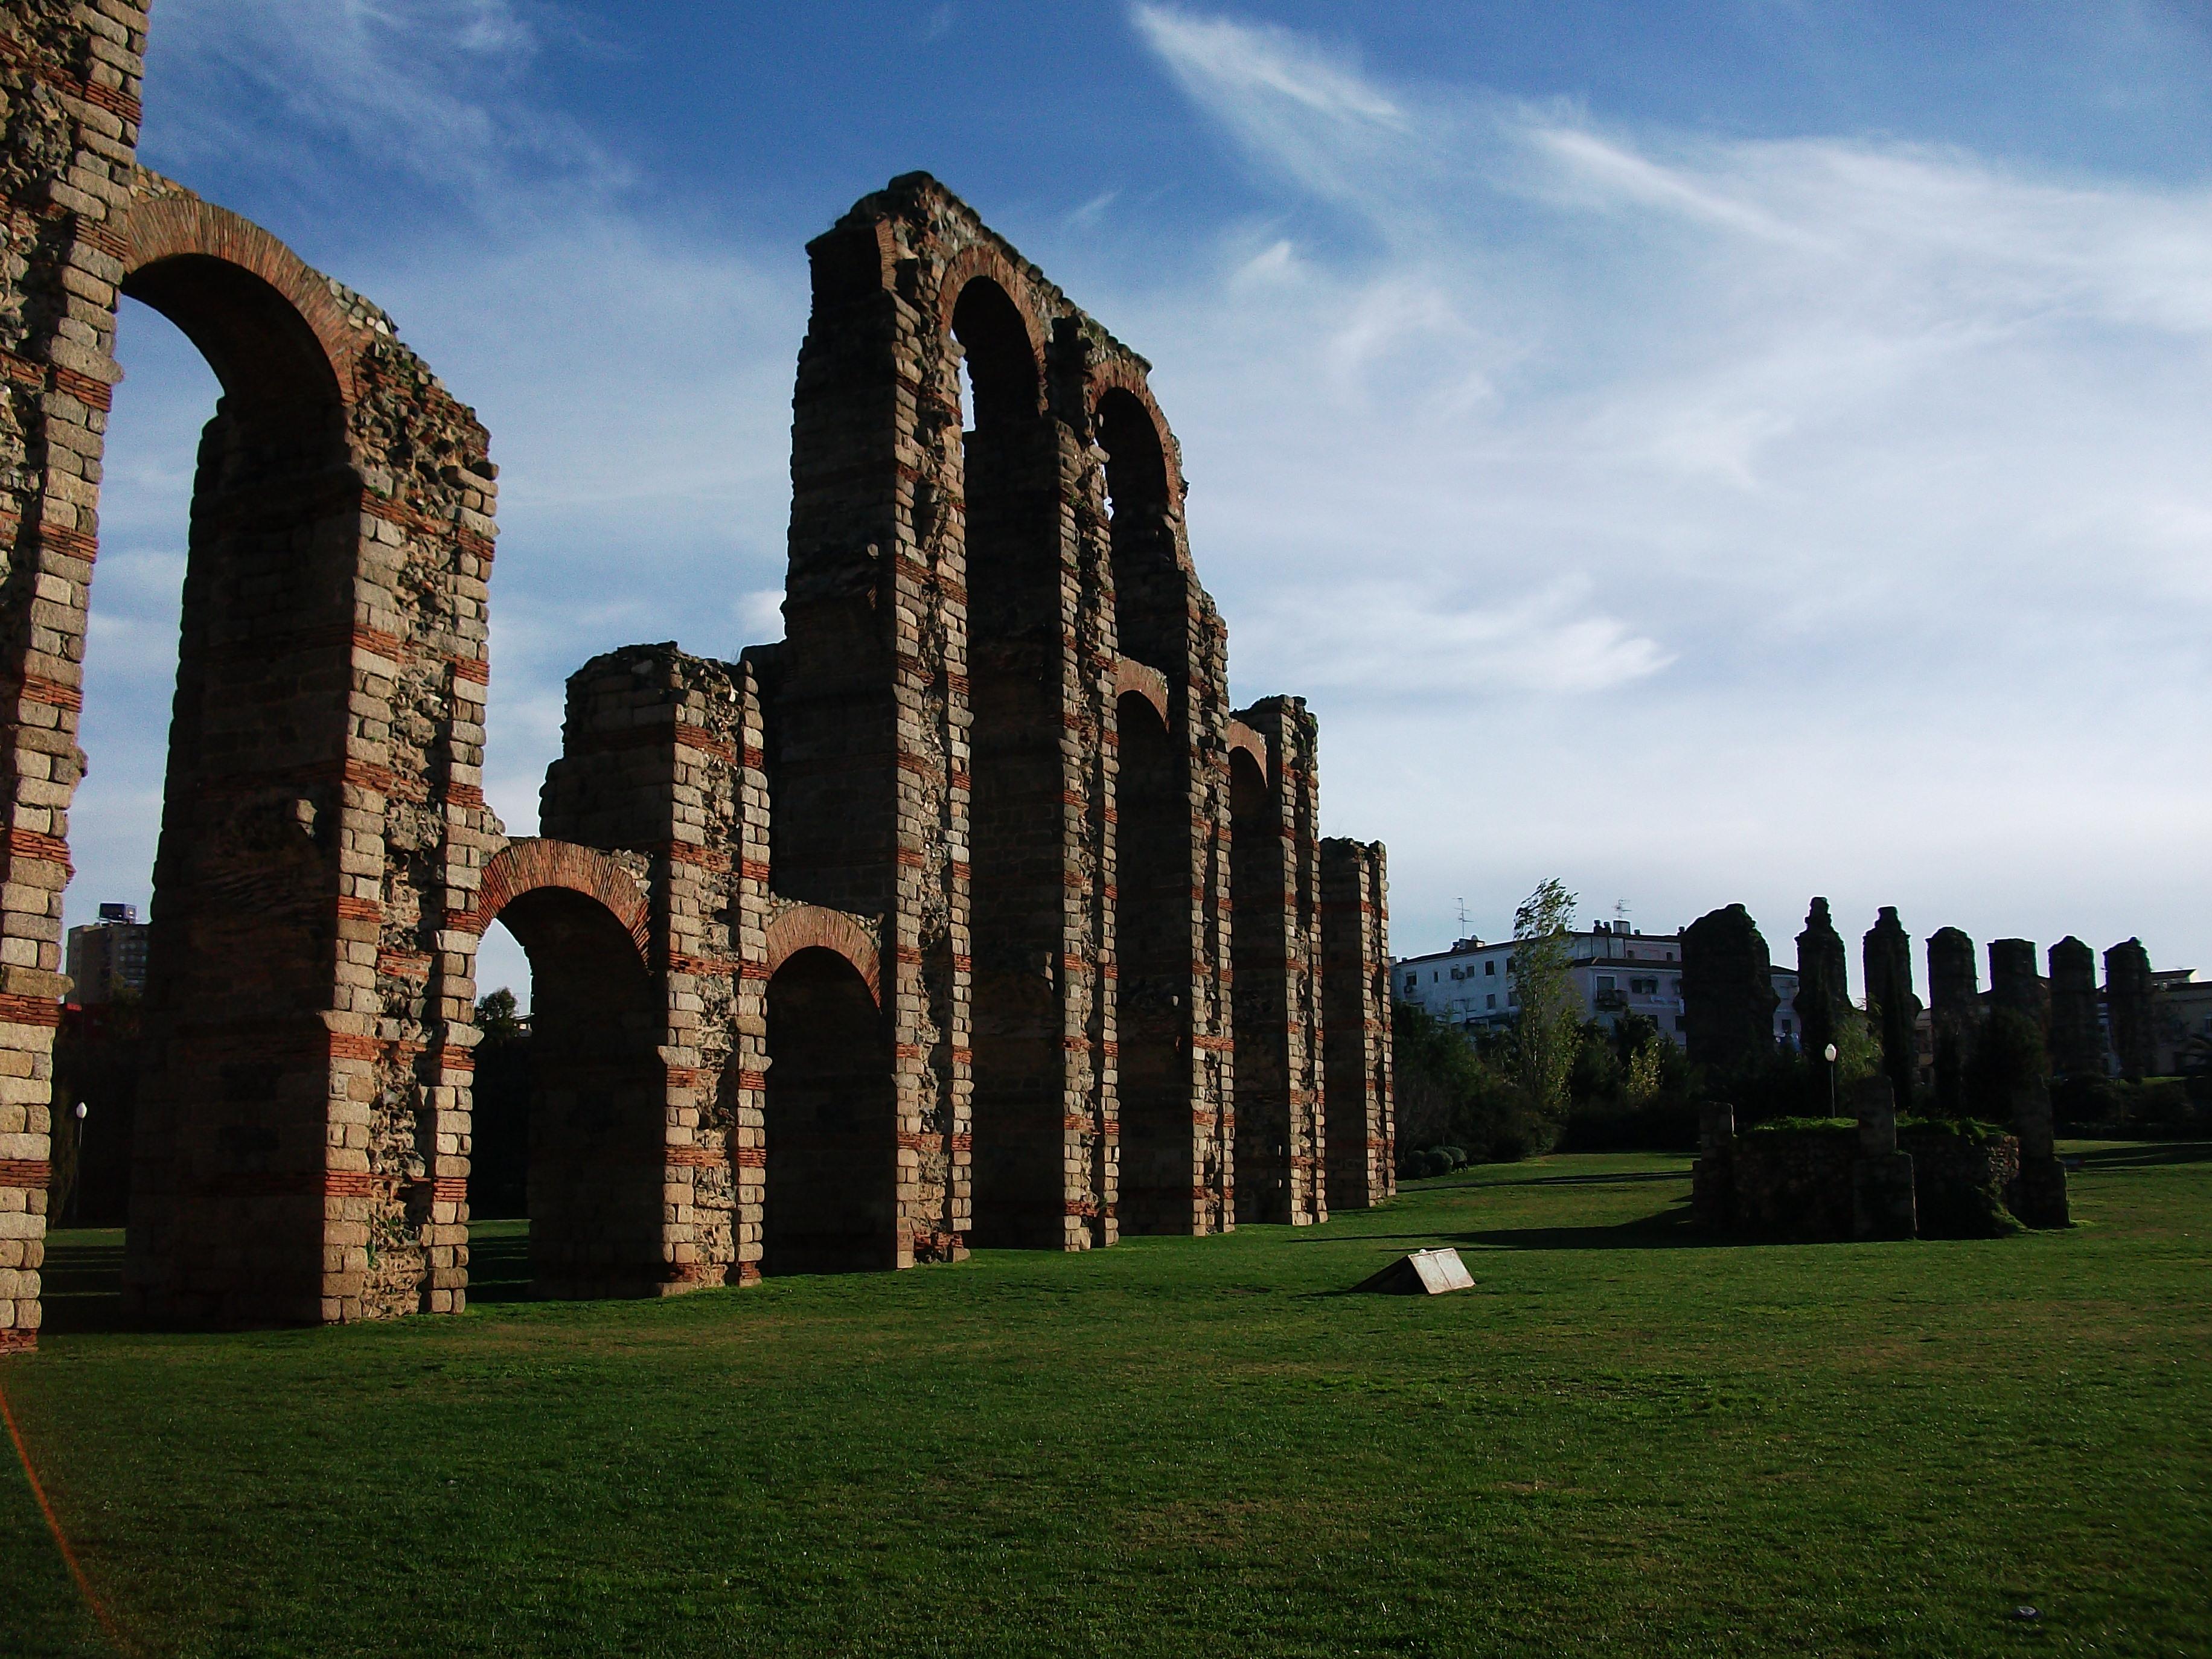 File:Acueducto romano de Mérida.jpg - Wikimedia Commons